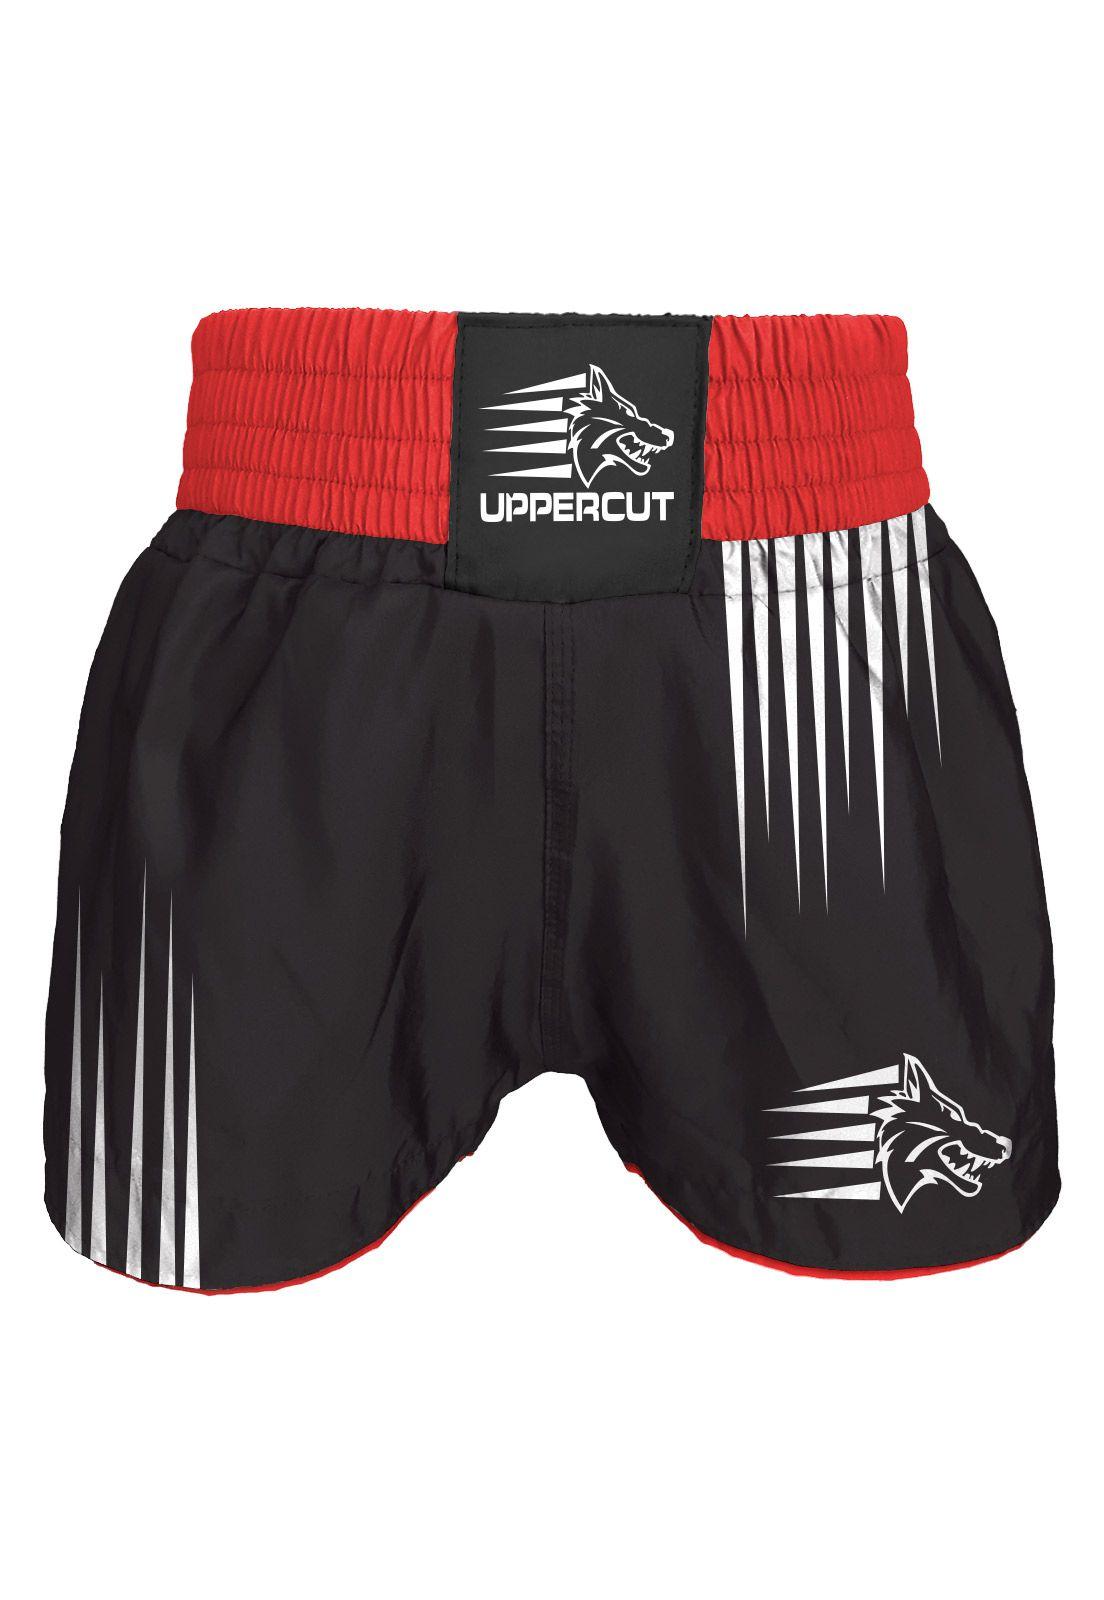 Short Uppercut Muay Thai Kickboxing Lister